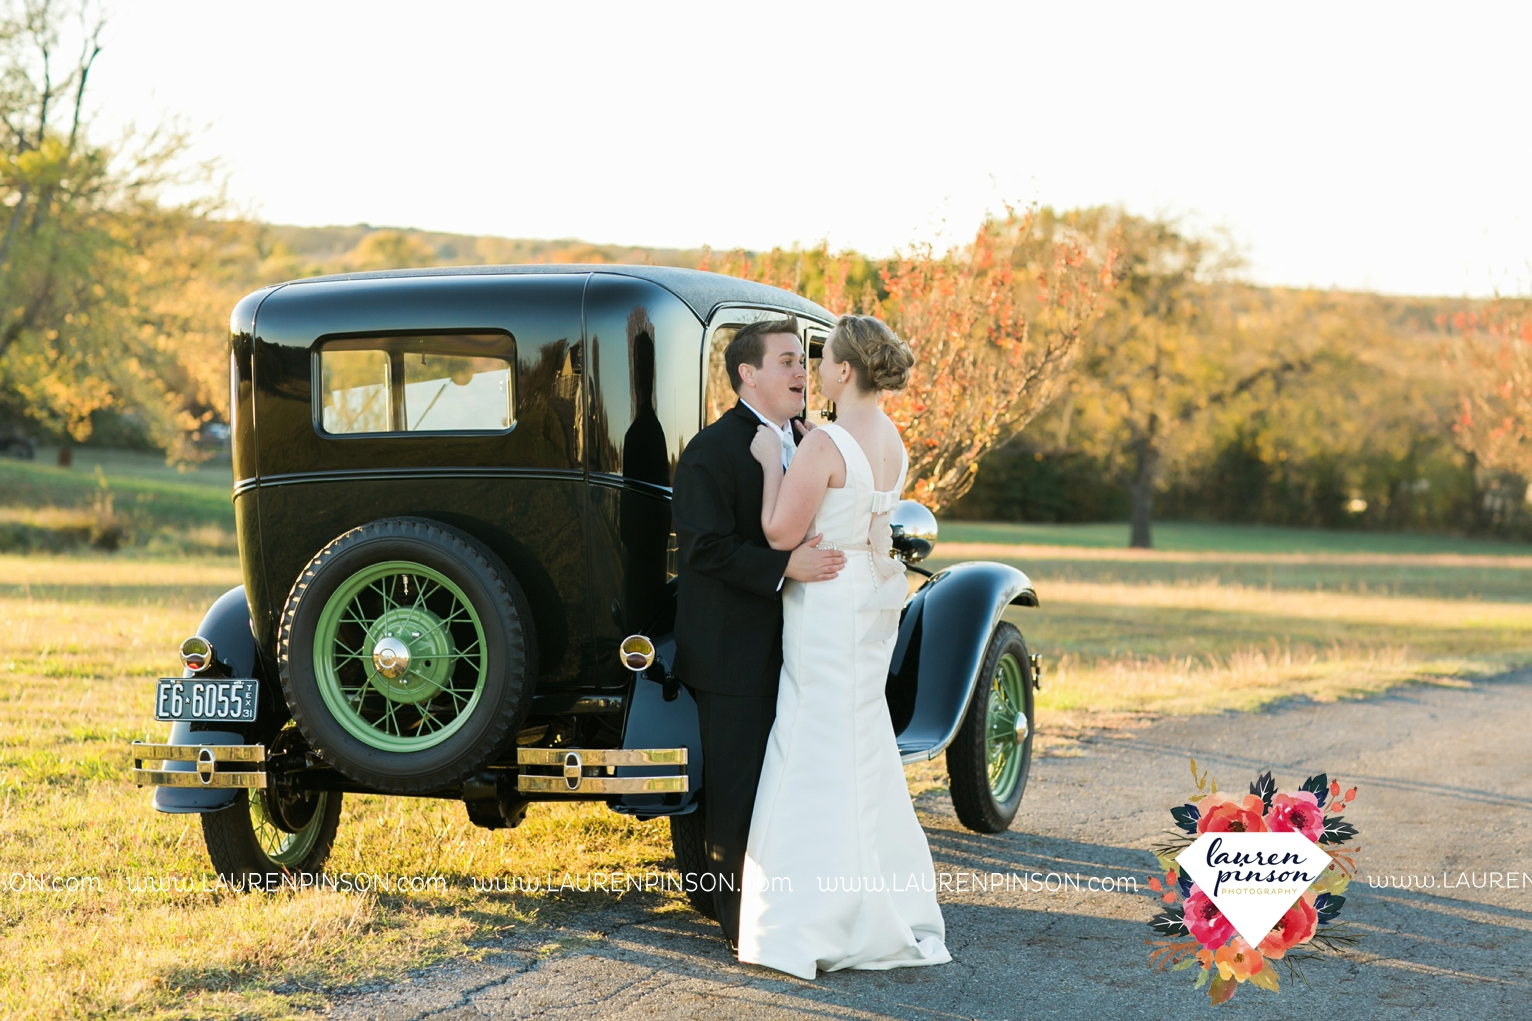 bells-texas-wedding-photography-at-willowood-ranch-chapel-north-texas-wichita-falls-wedding-photographer_1854.jpg